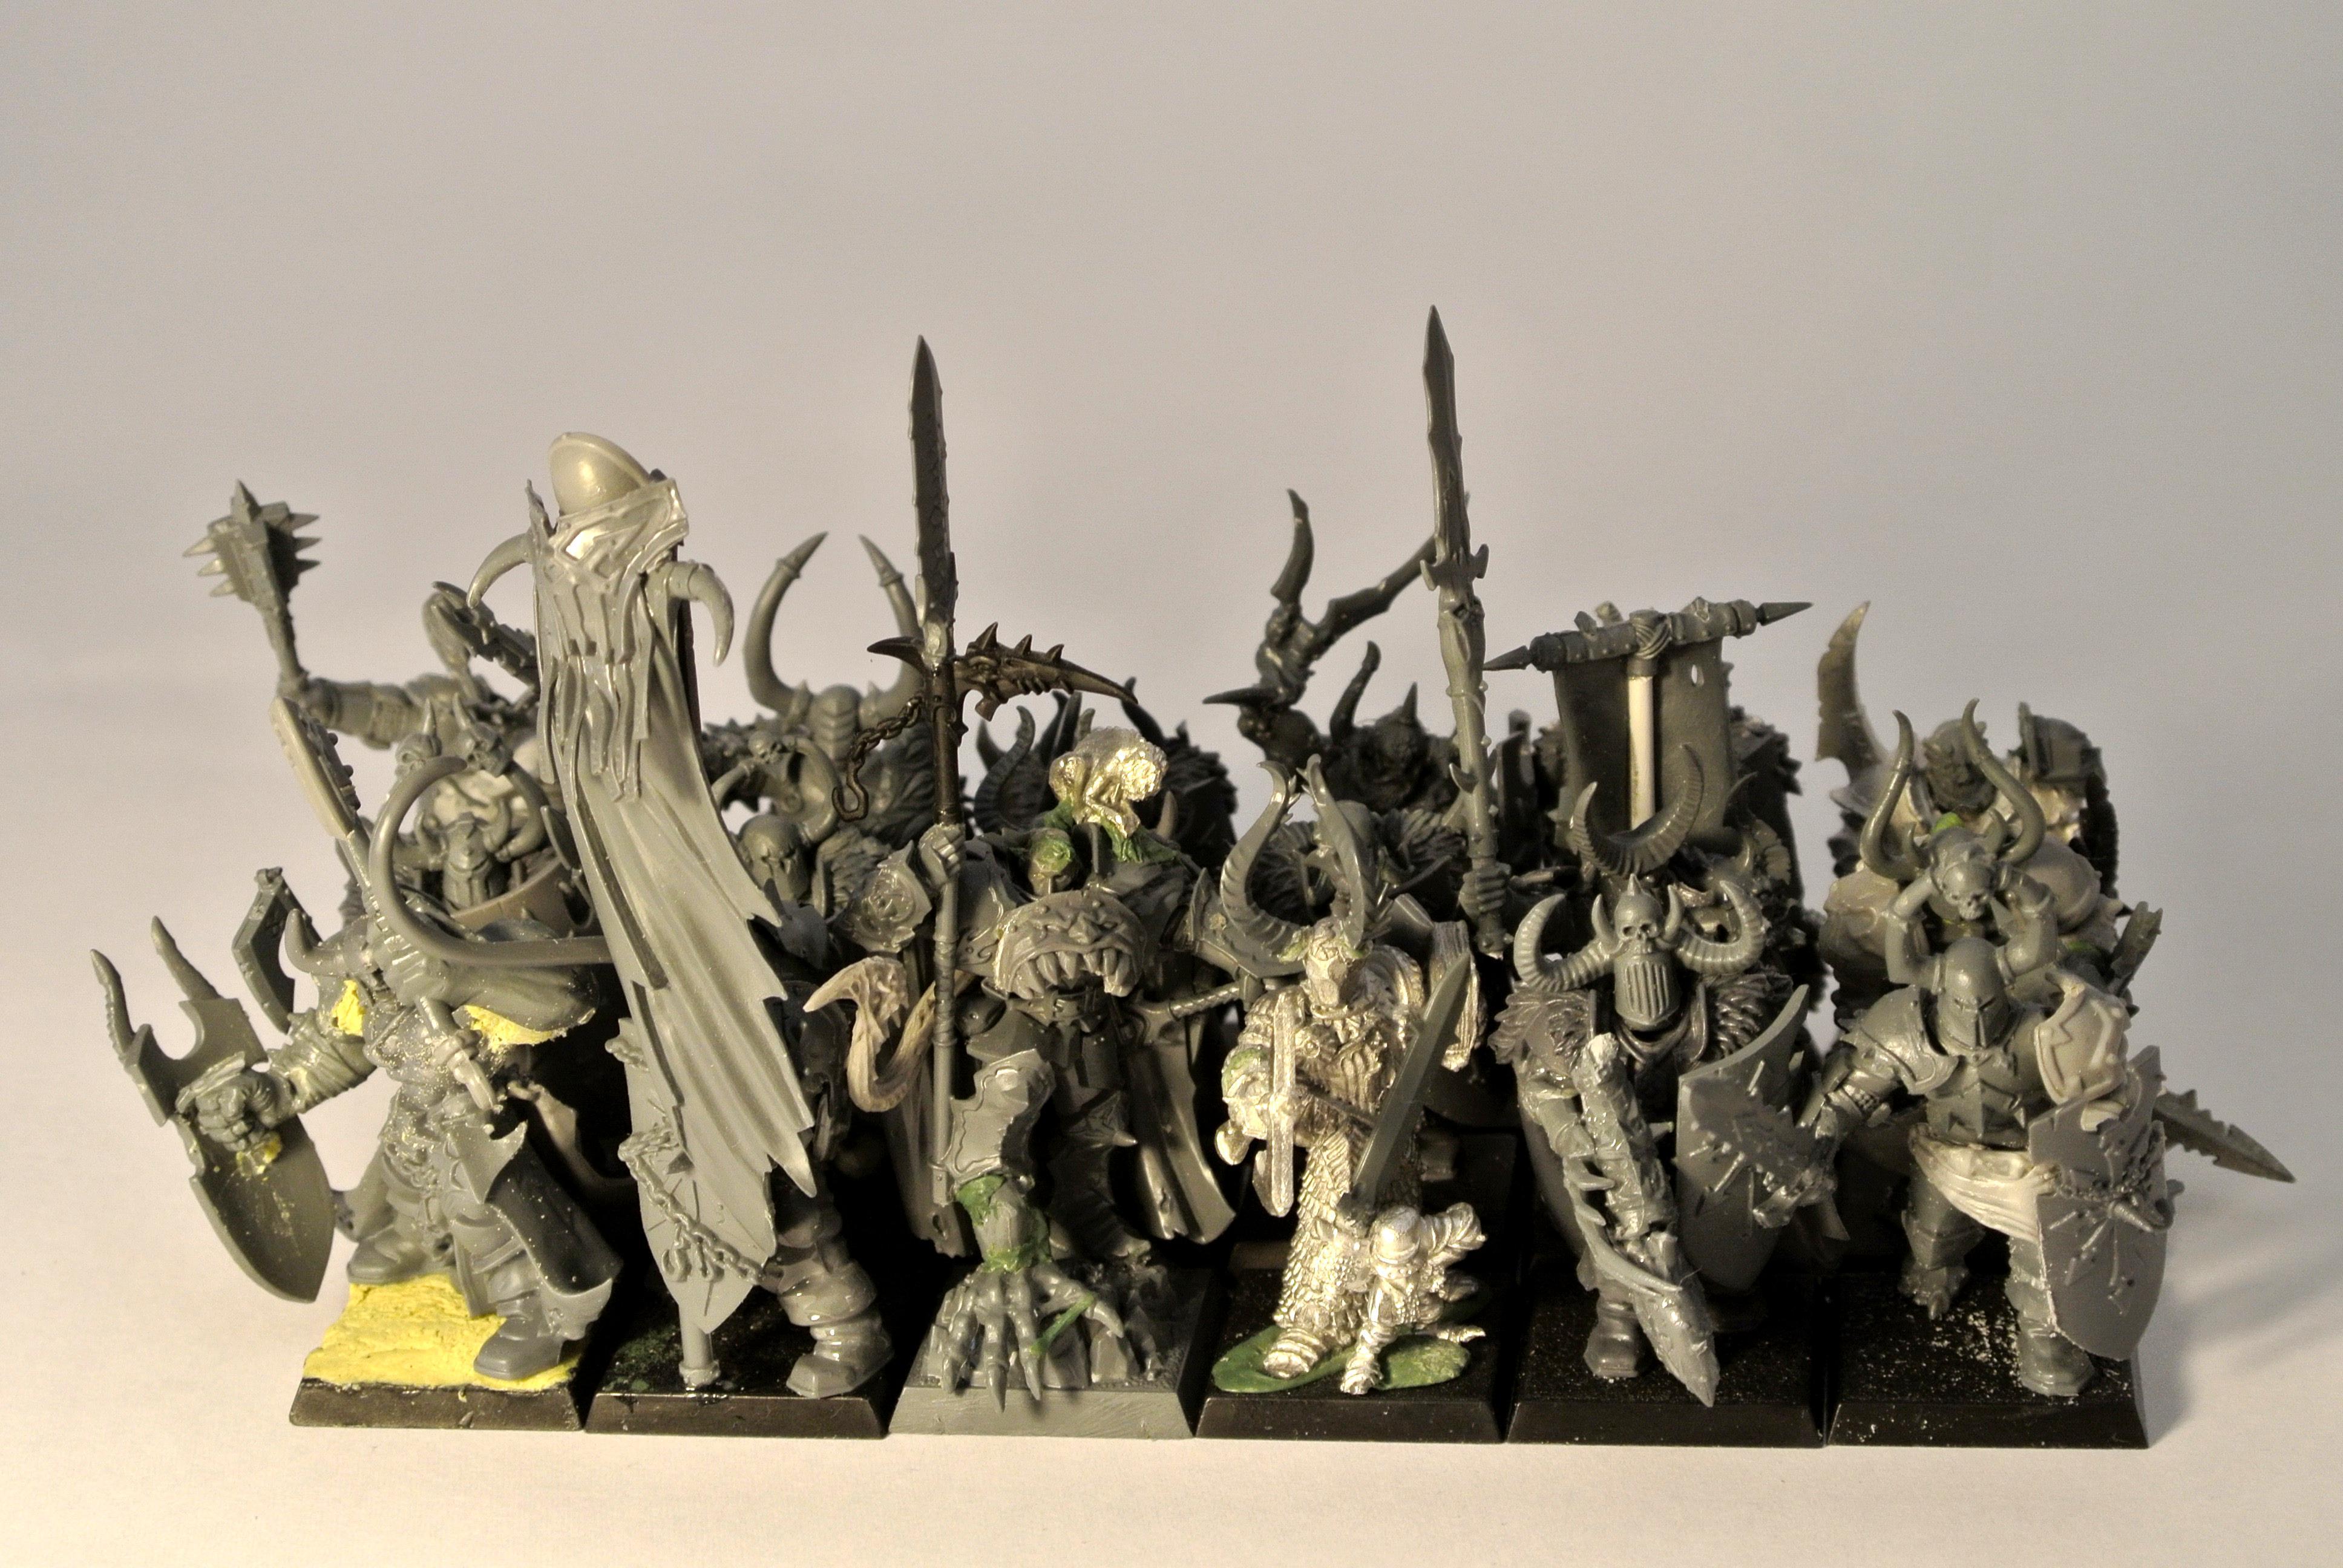 Chaos, Convereted Chosen, Convereted Daemon Prince, Conversion, Kit Bash, Kitbash Chaos Knights, Old School, Oldhammer, Tzeentch, Tzeentch Whfb Kitbash Conversion Chaos Scarydoneright, Warhammer Fanatsy, Warhammer Fantasy